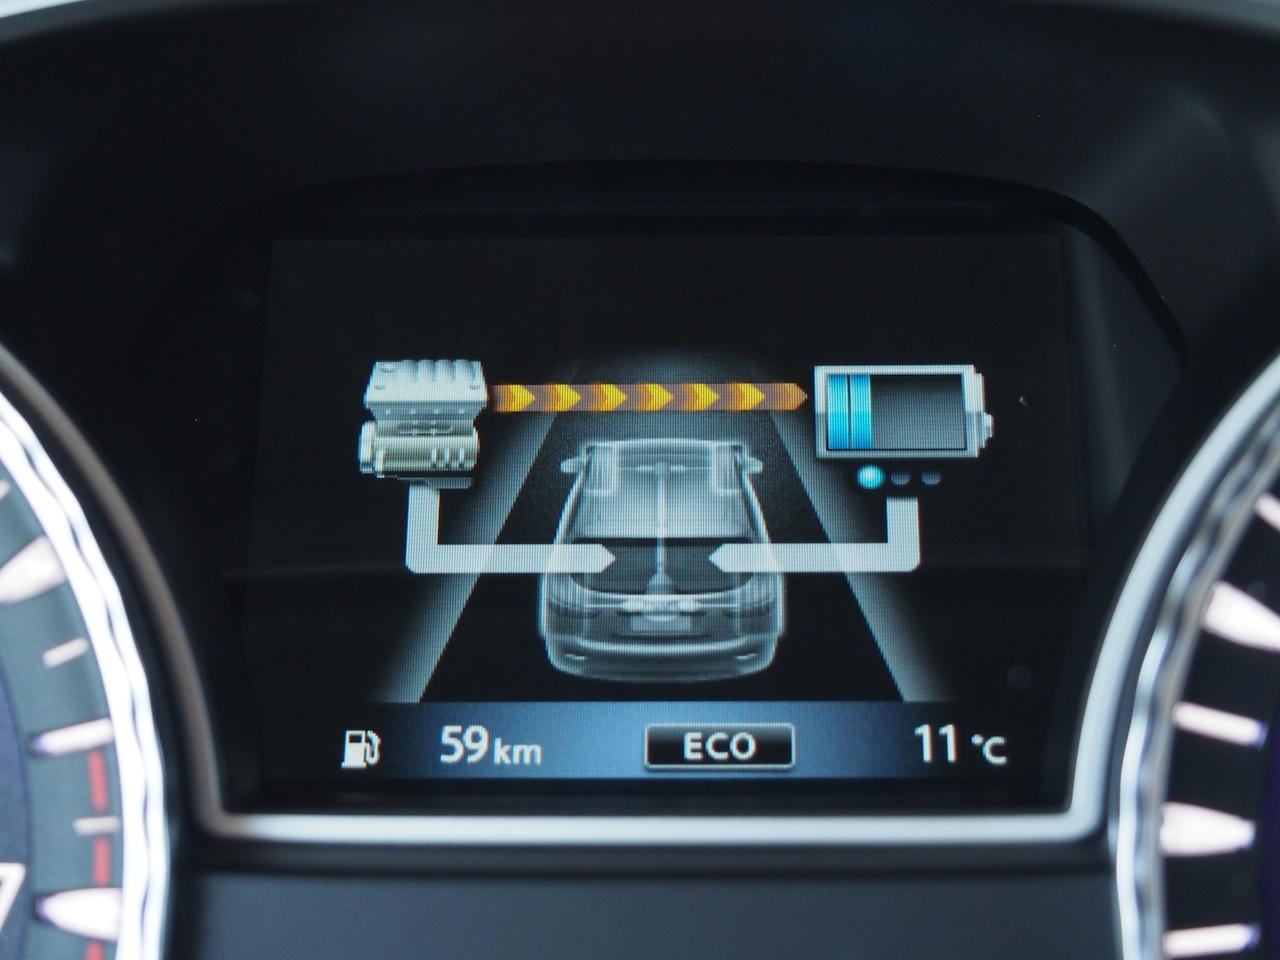 2014 Infiniti QX60 Hybrid Review - Cars, Photos, Test ...